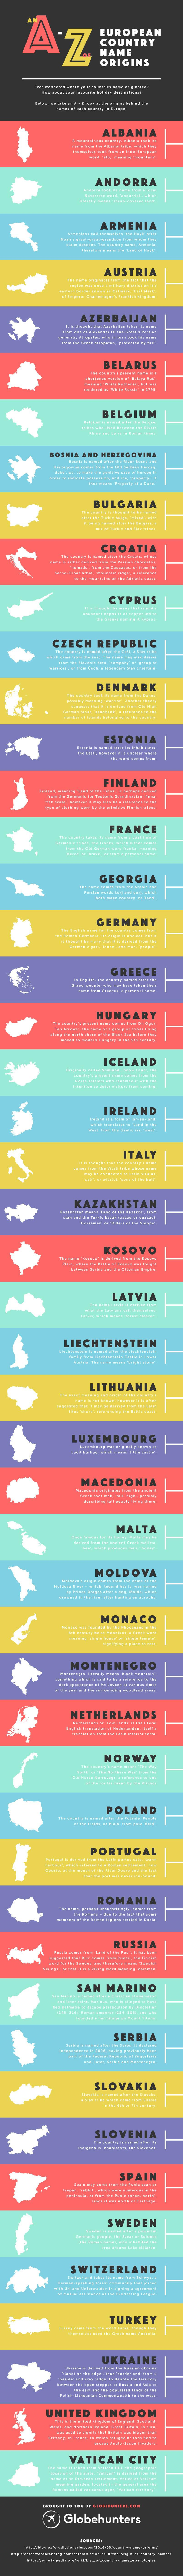 The origin of European country names